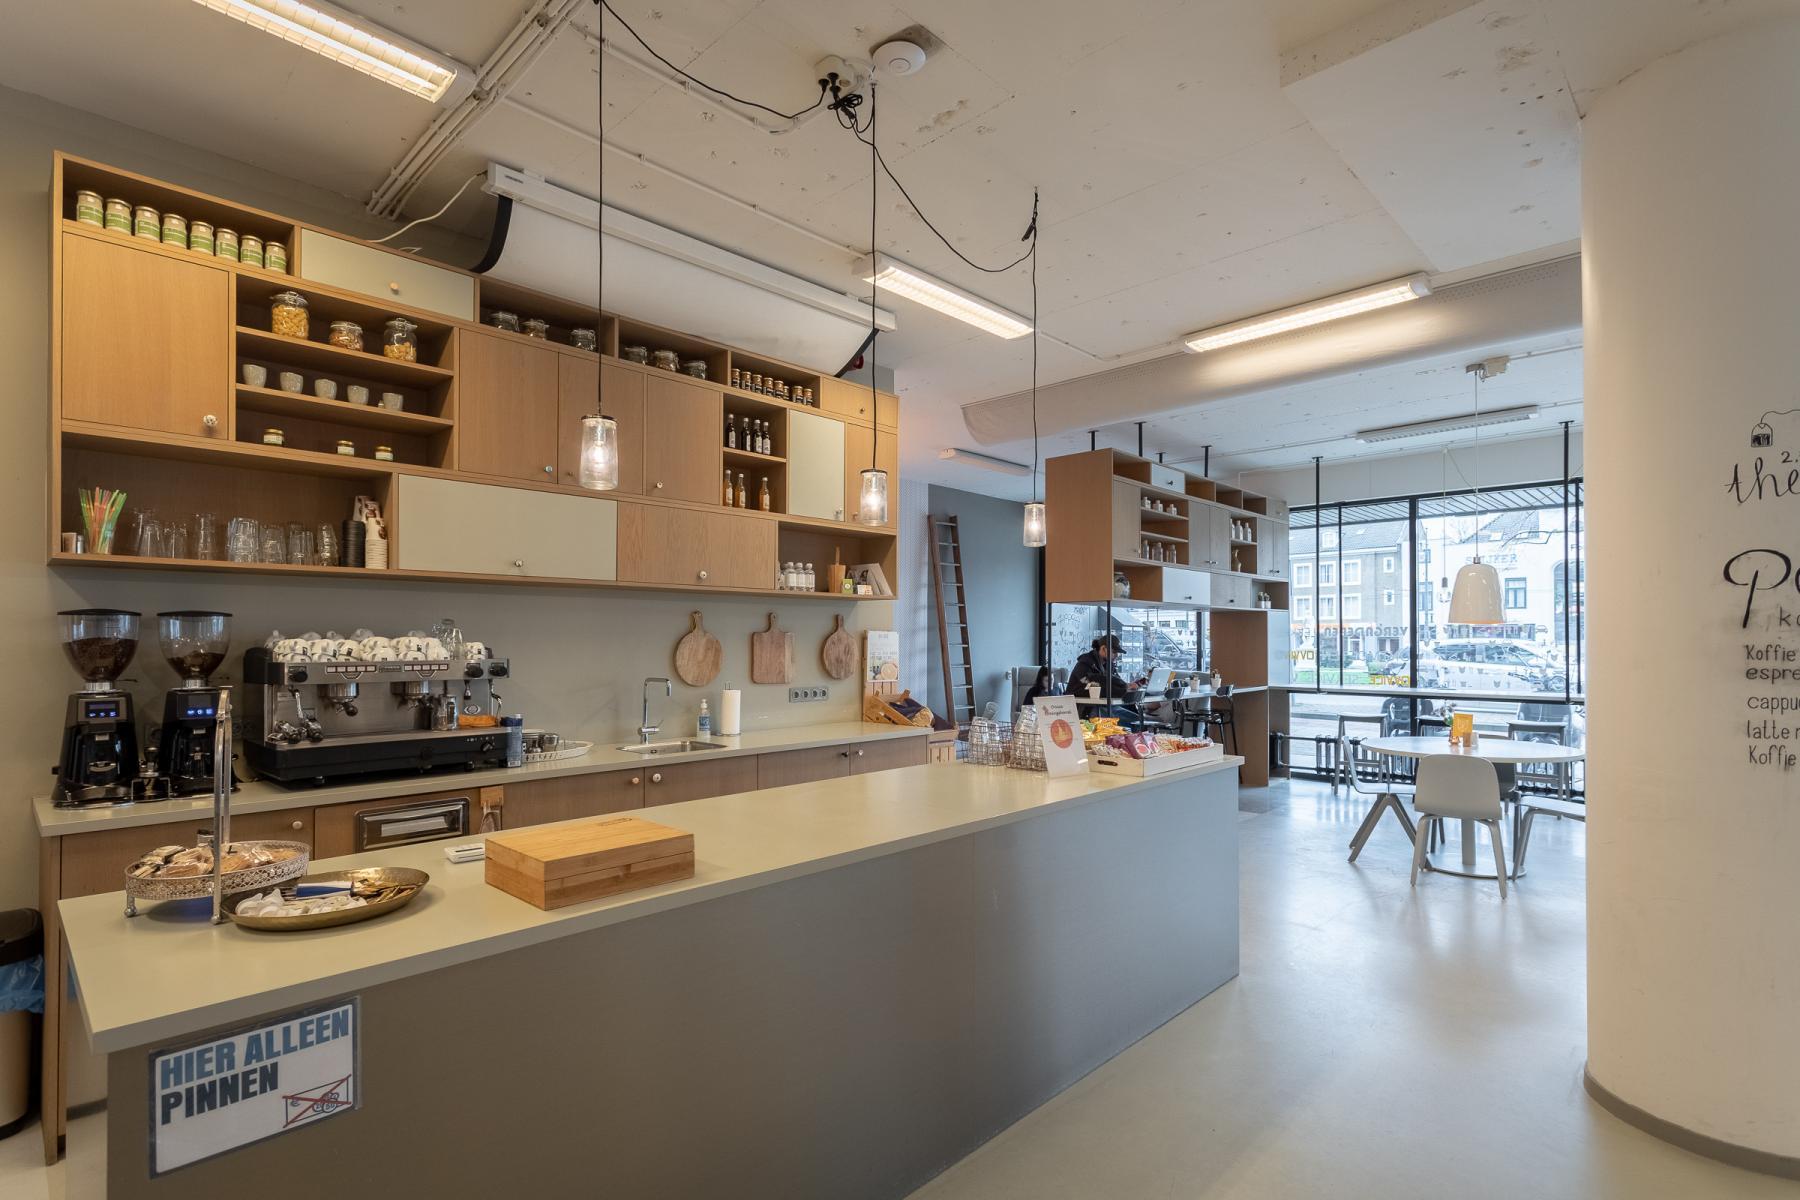 barretje lunchroom kantine eten keuken Arnhem kantoorruimte kantoorpand